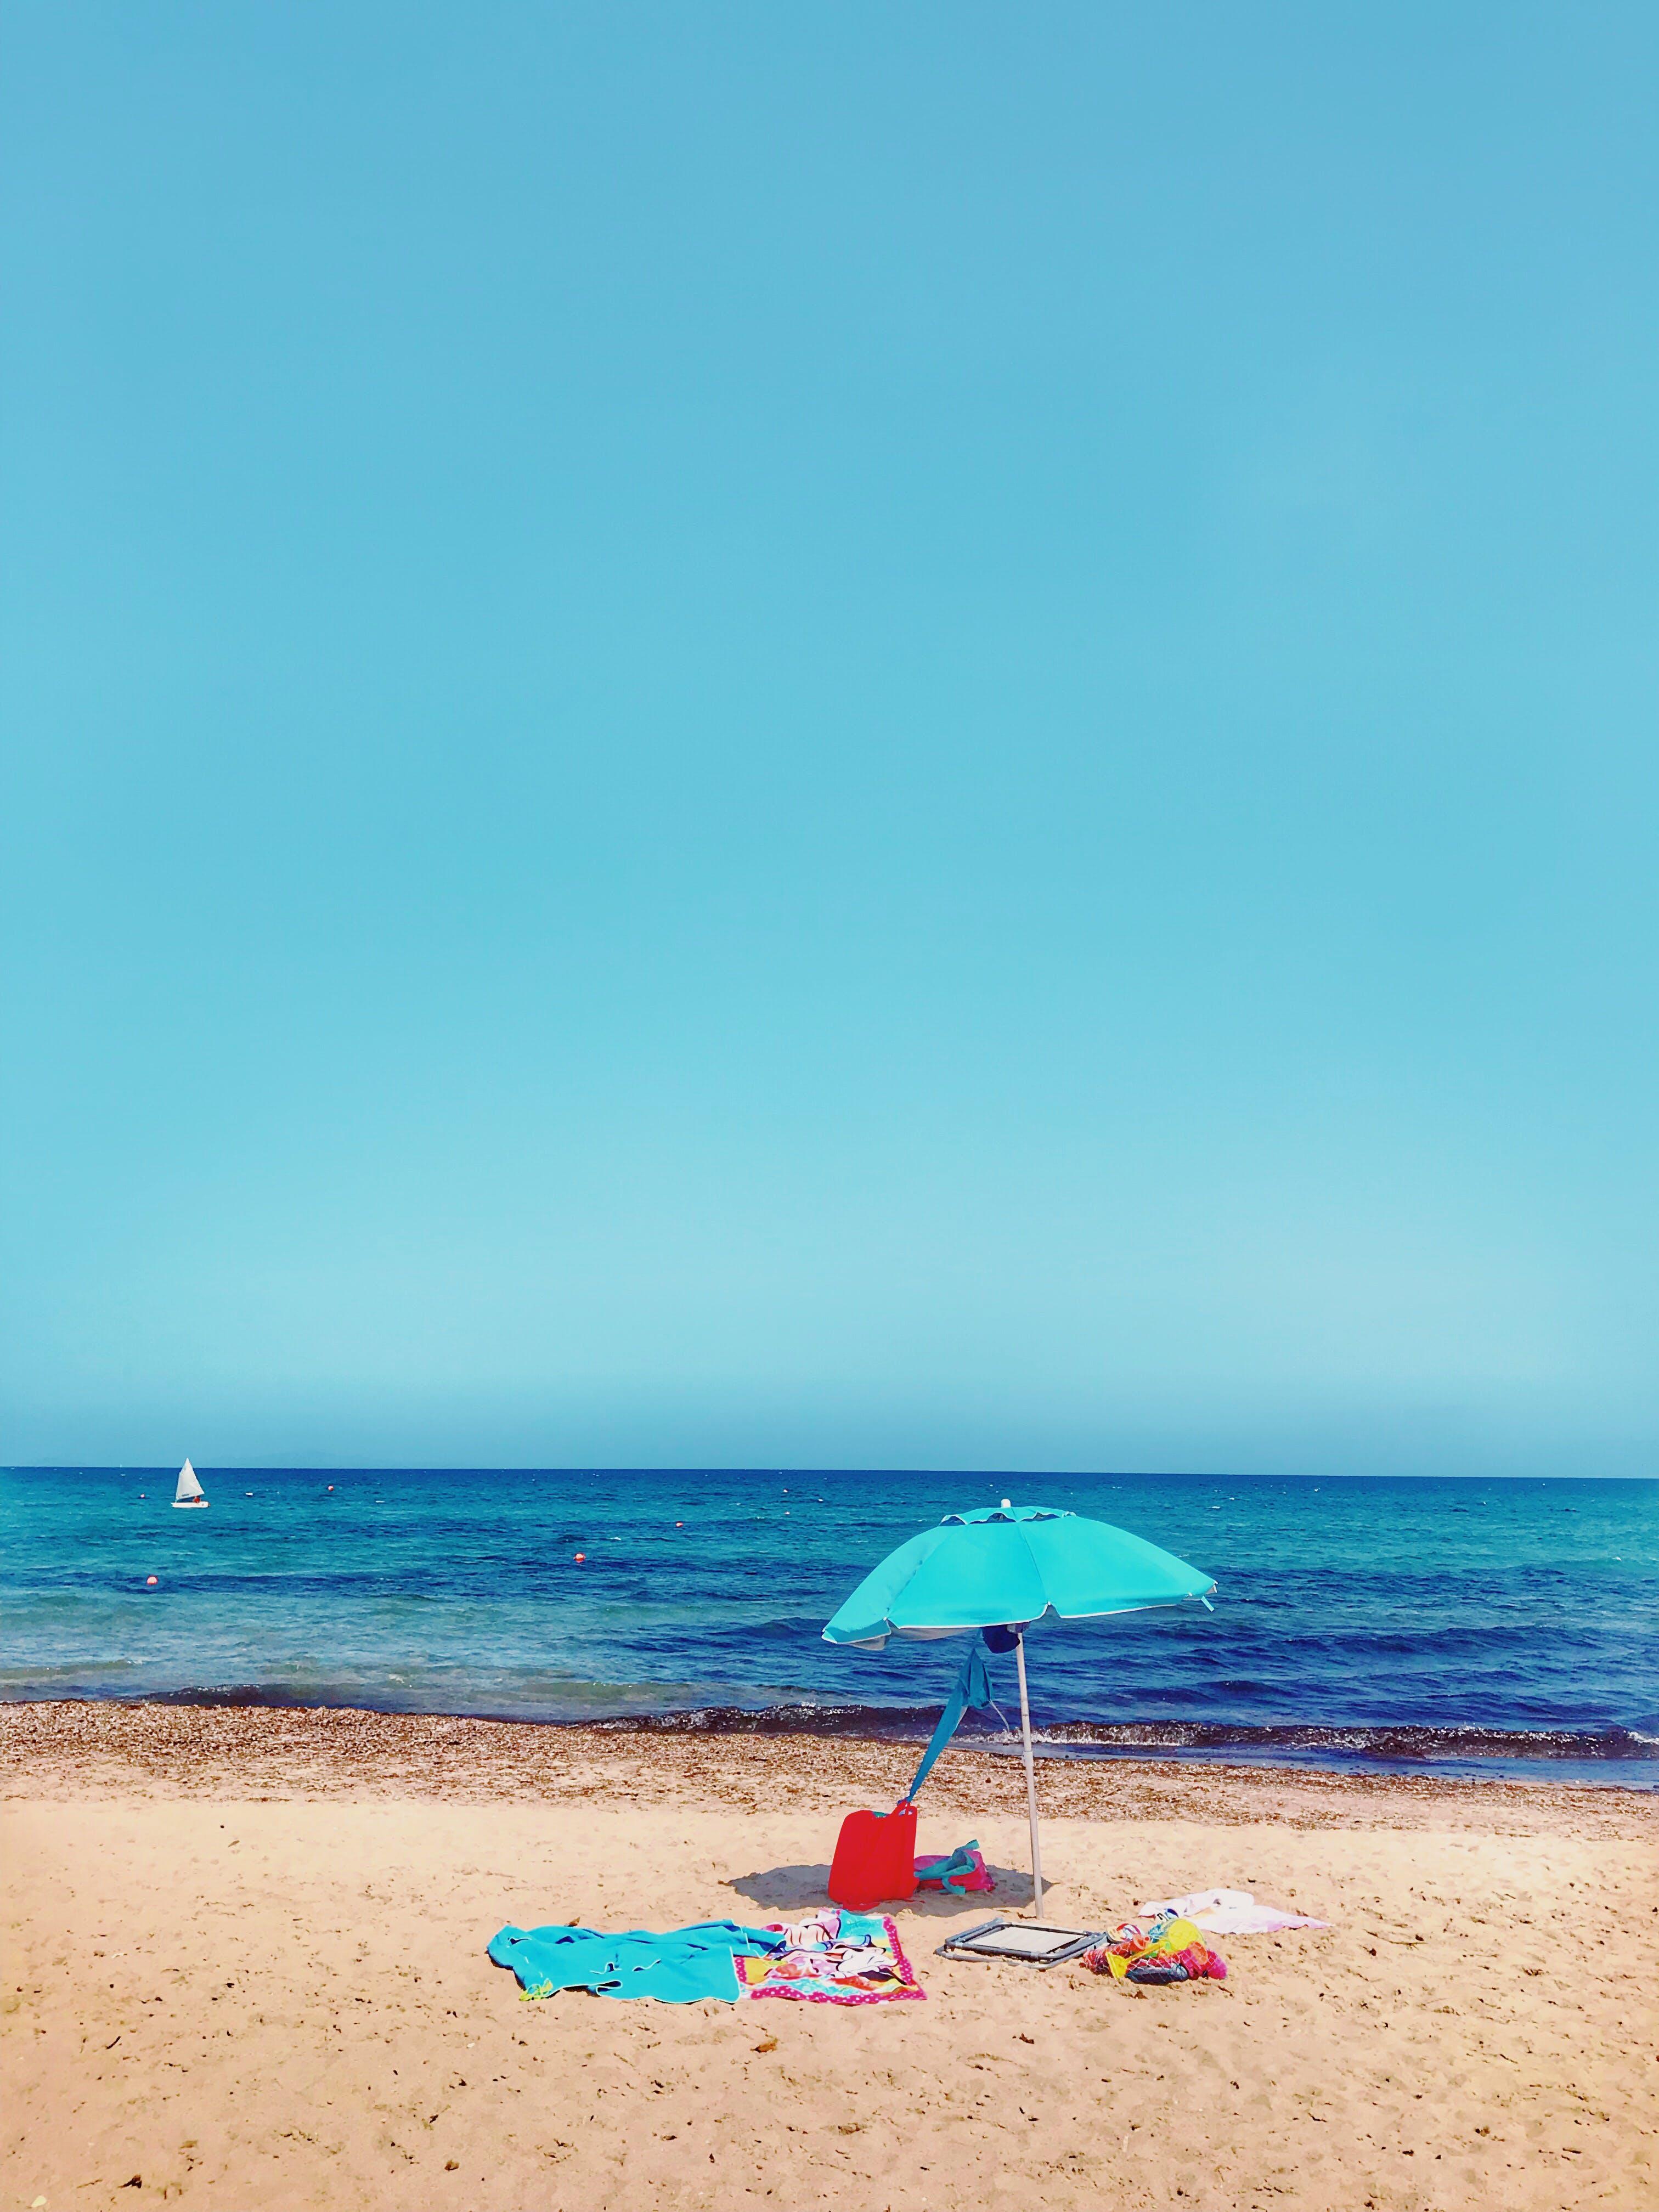 Gratis stockfoto met blikveld, h2o, hemel, oceaan